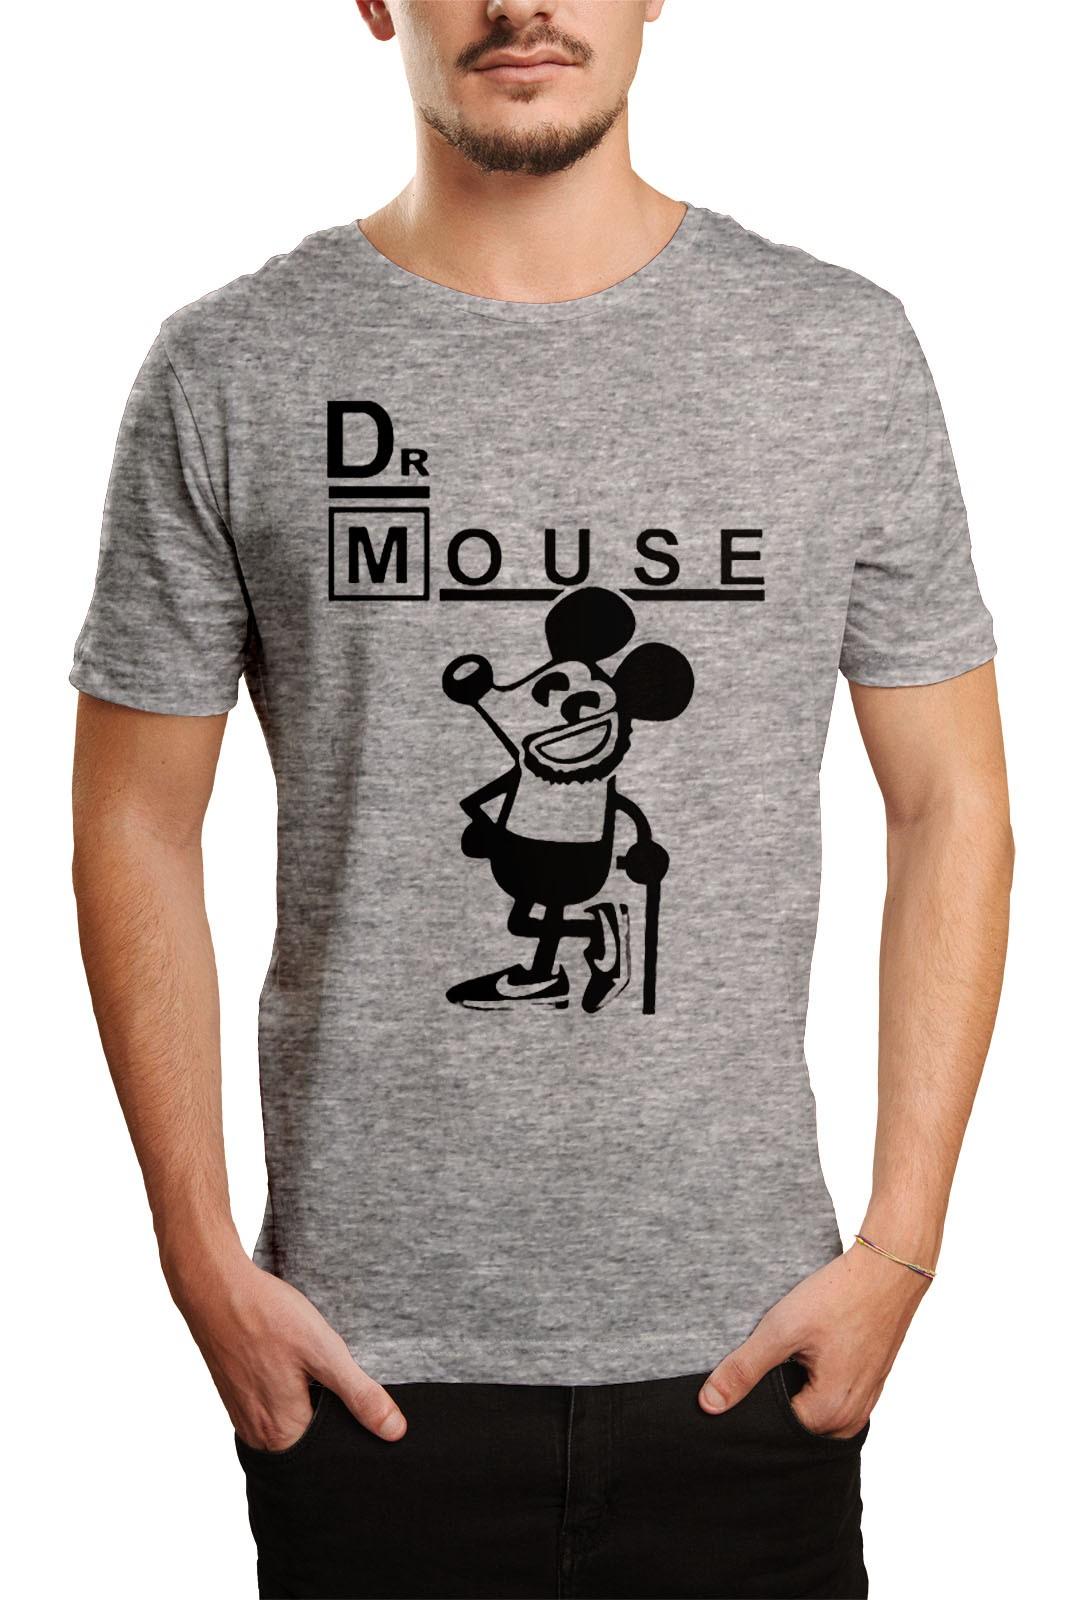 Camiseta HShop Dr Mouse Cinza  - HShop